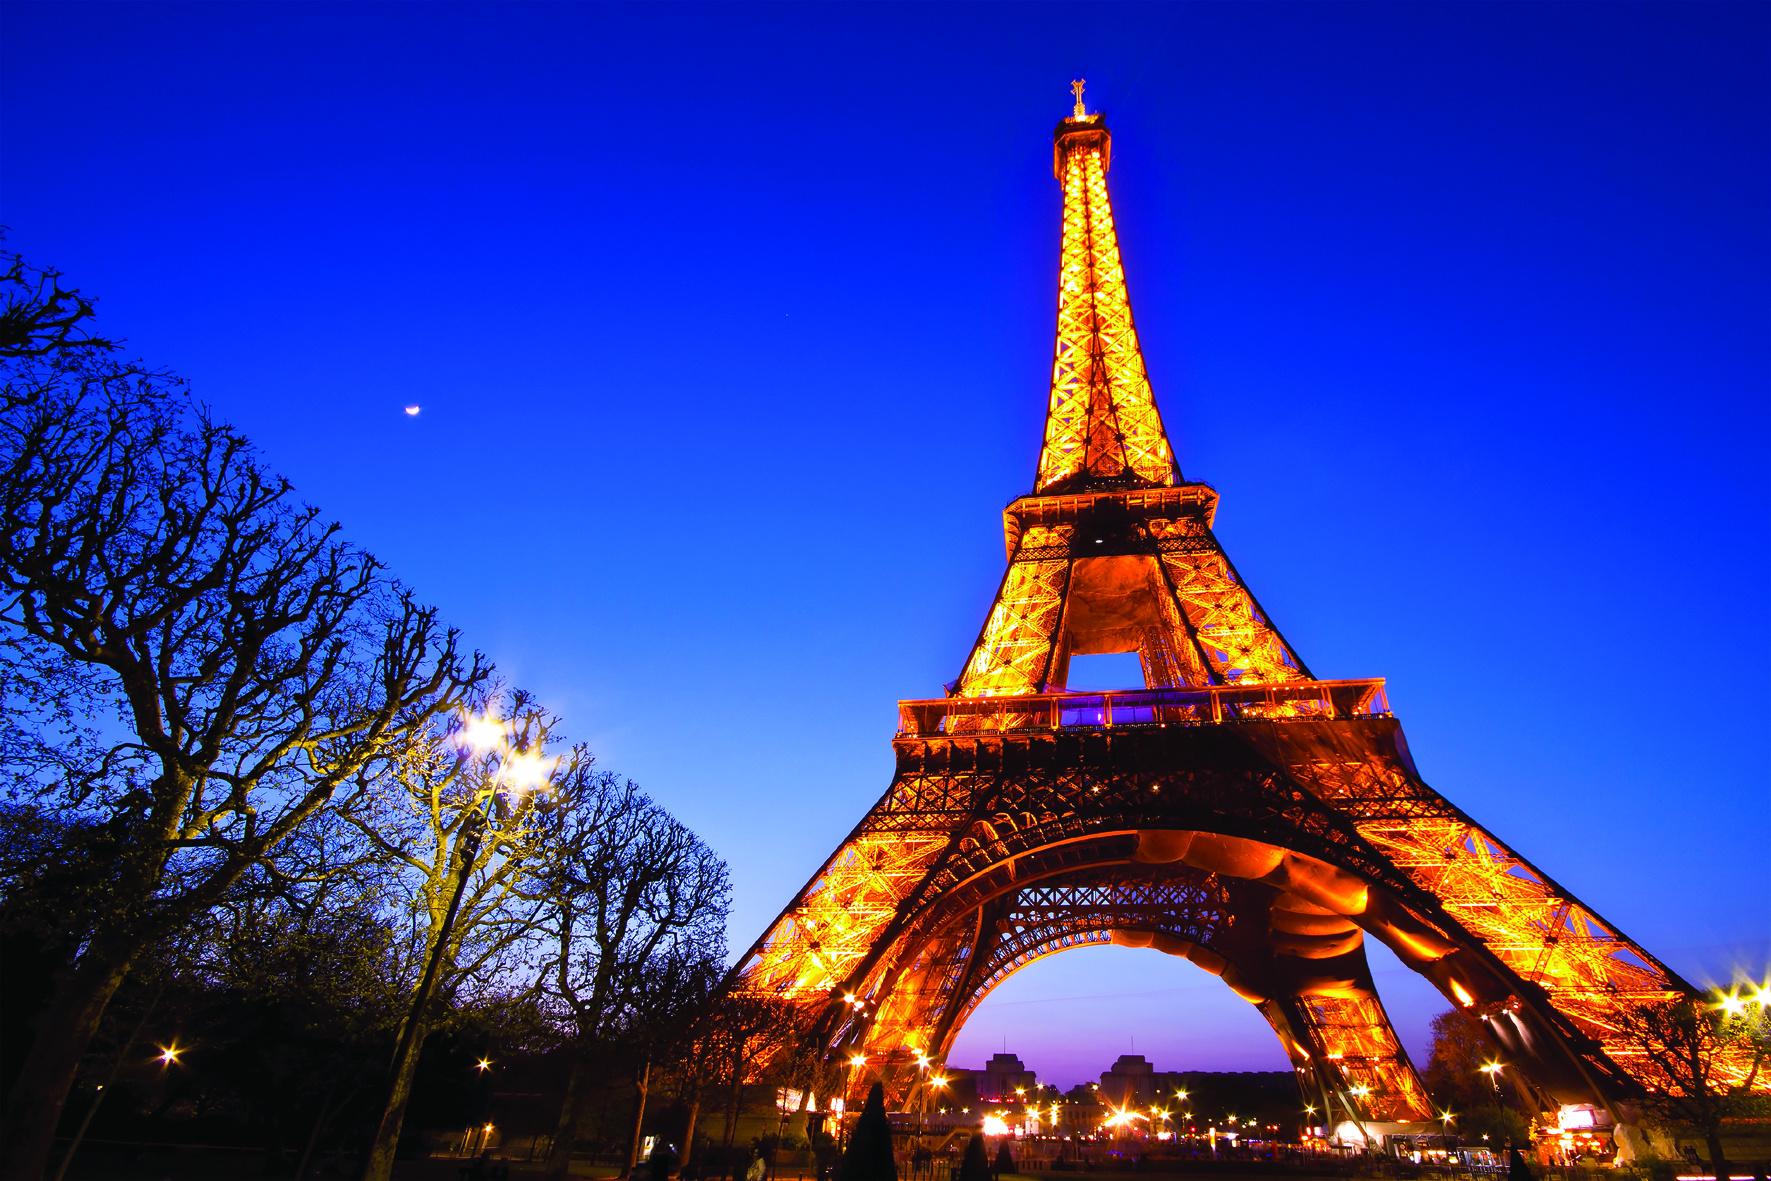 torre_eifel_paris_frança_2 10